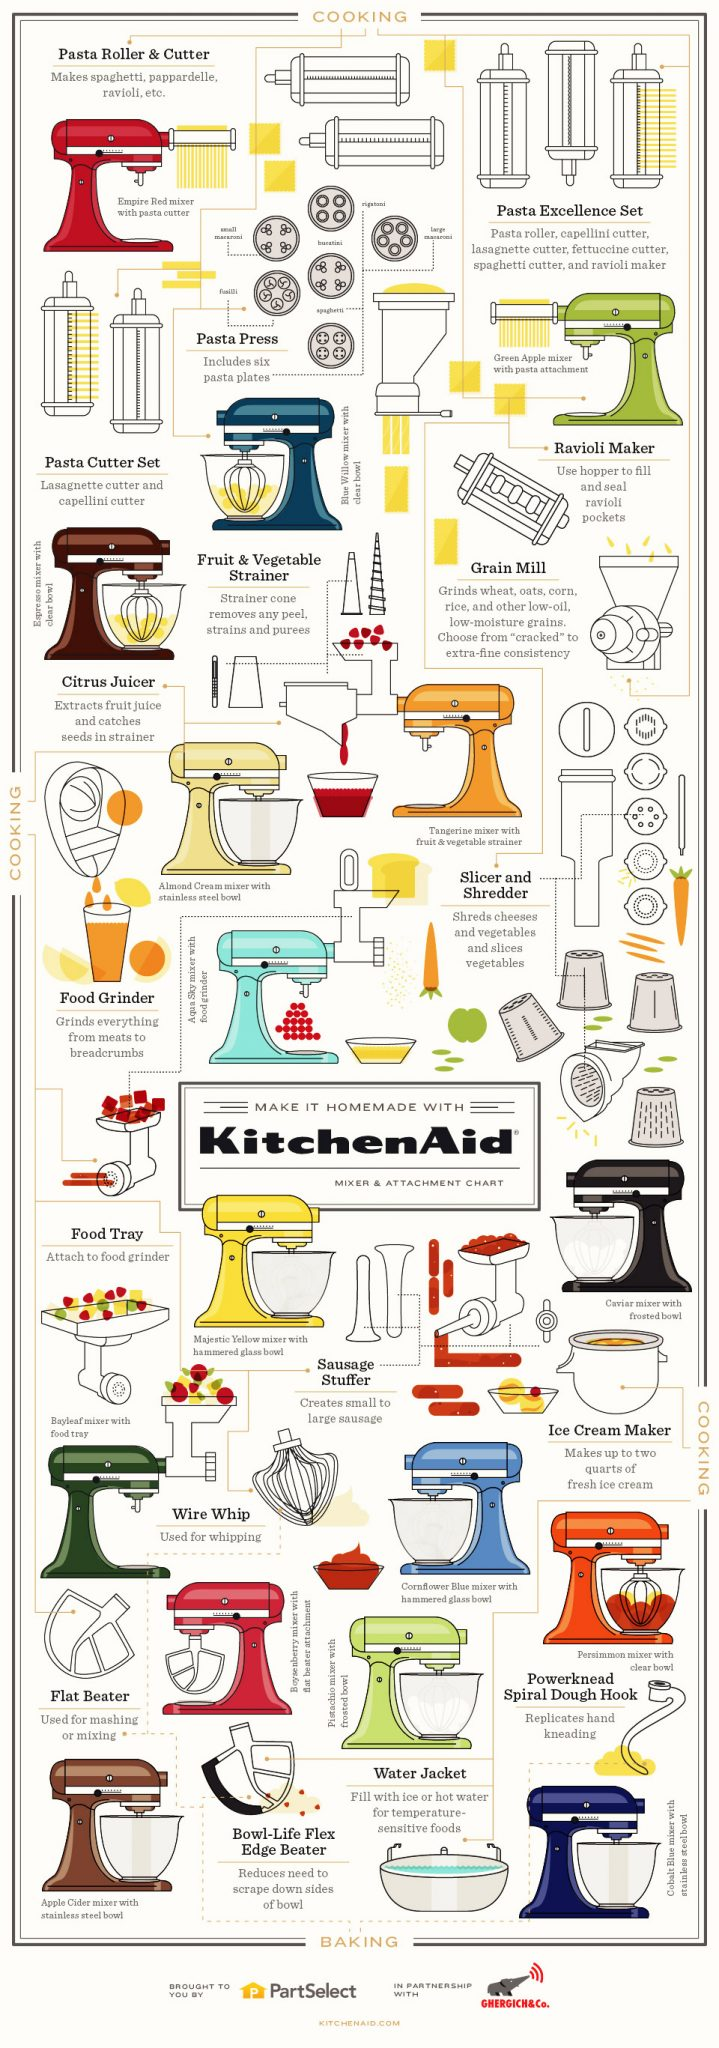 KitchenAid-Infographic